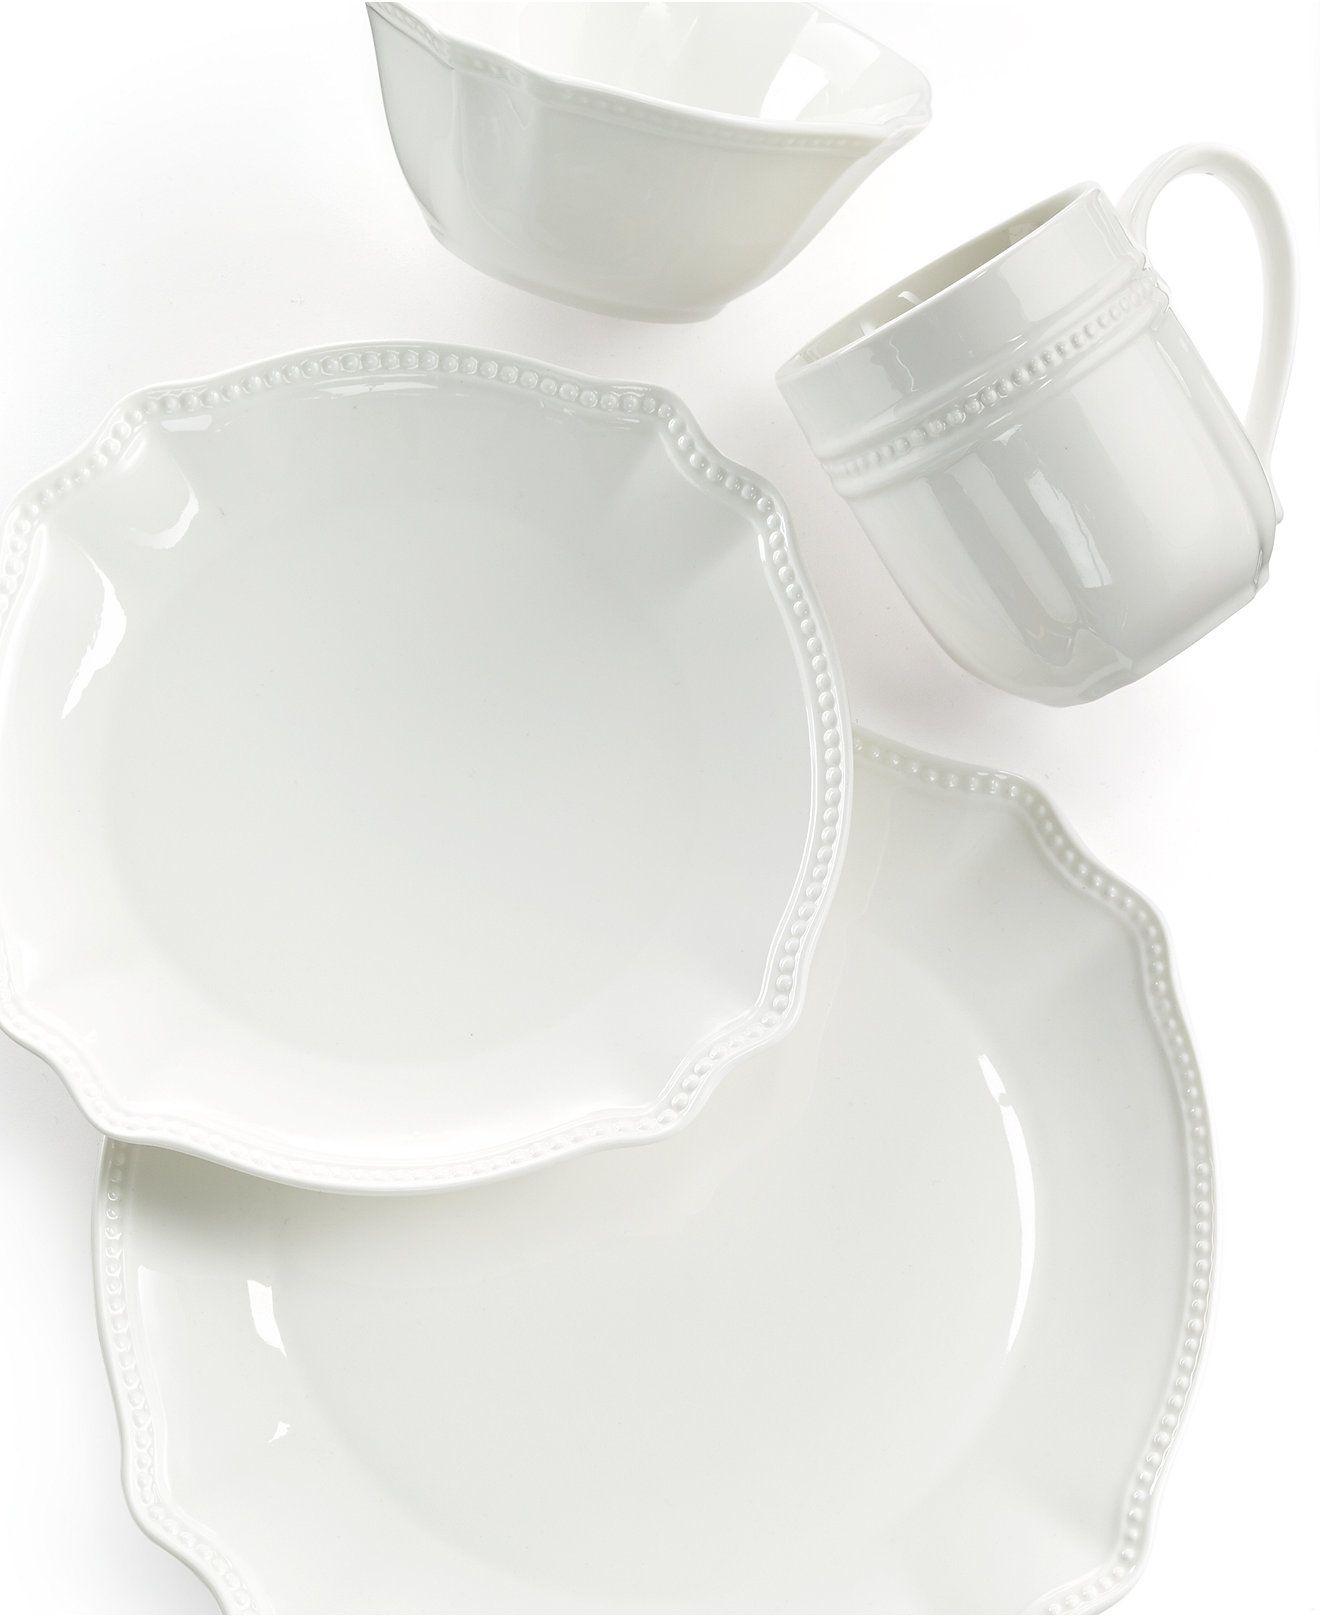 Isaac Mizrahi Diva Chic 4-Piece Place Setting - Dinnerware - Dining u0026 Entertaining -  sc 1 st  Pinterest & Isaac Mizrahi Diva Chic 4-Piece Place Setting - Dinnerware - Dining ...